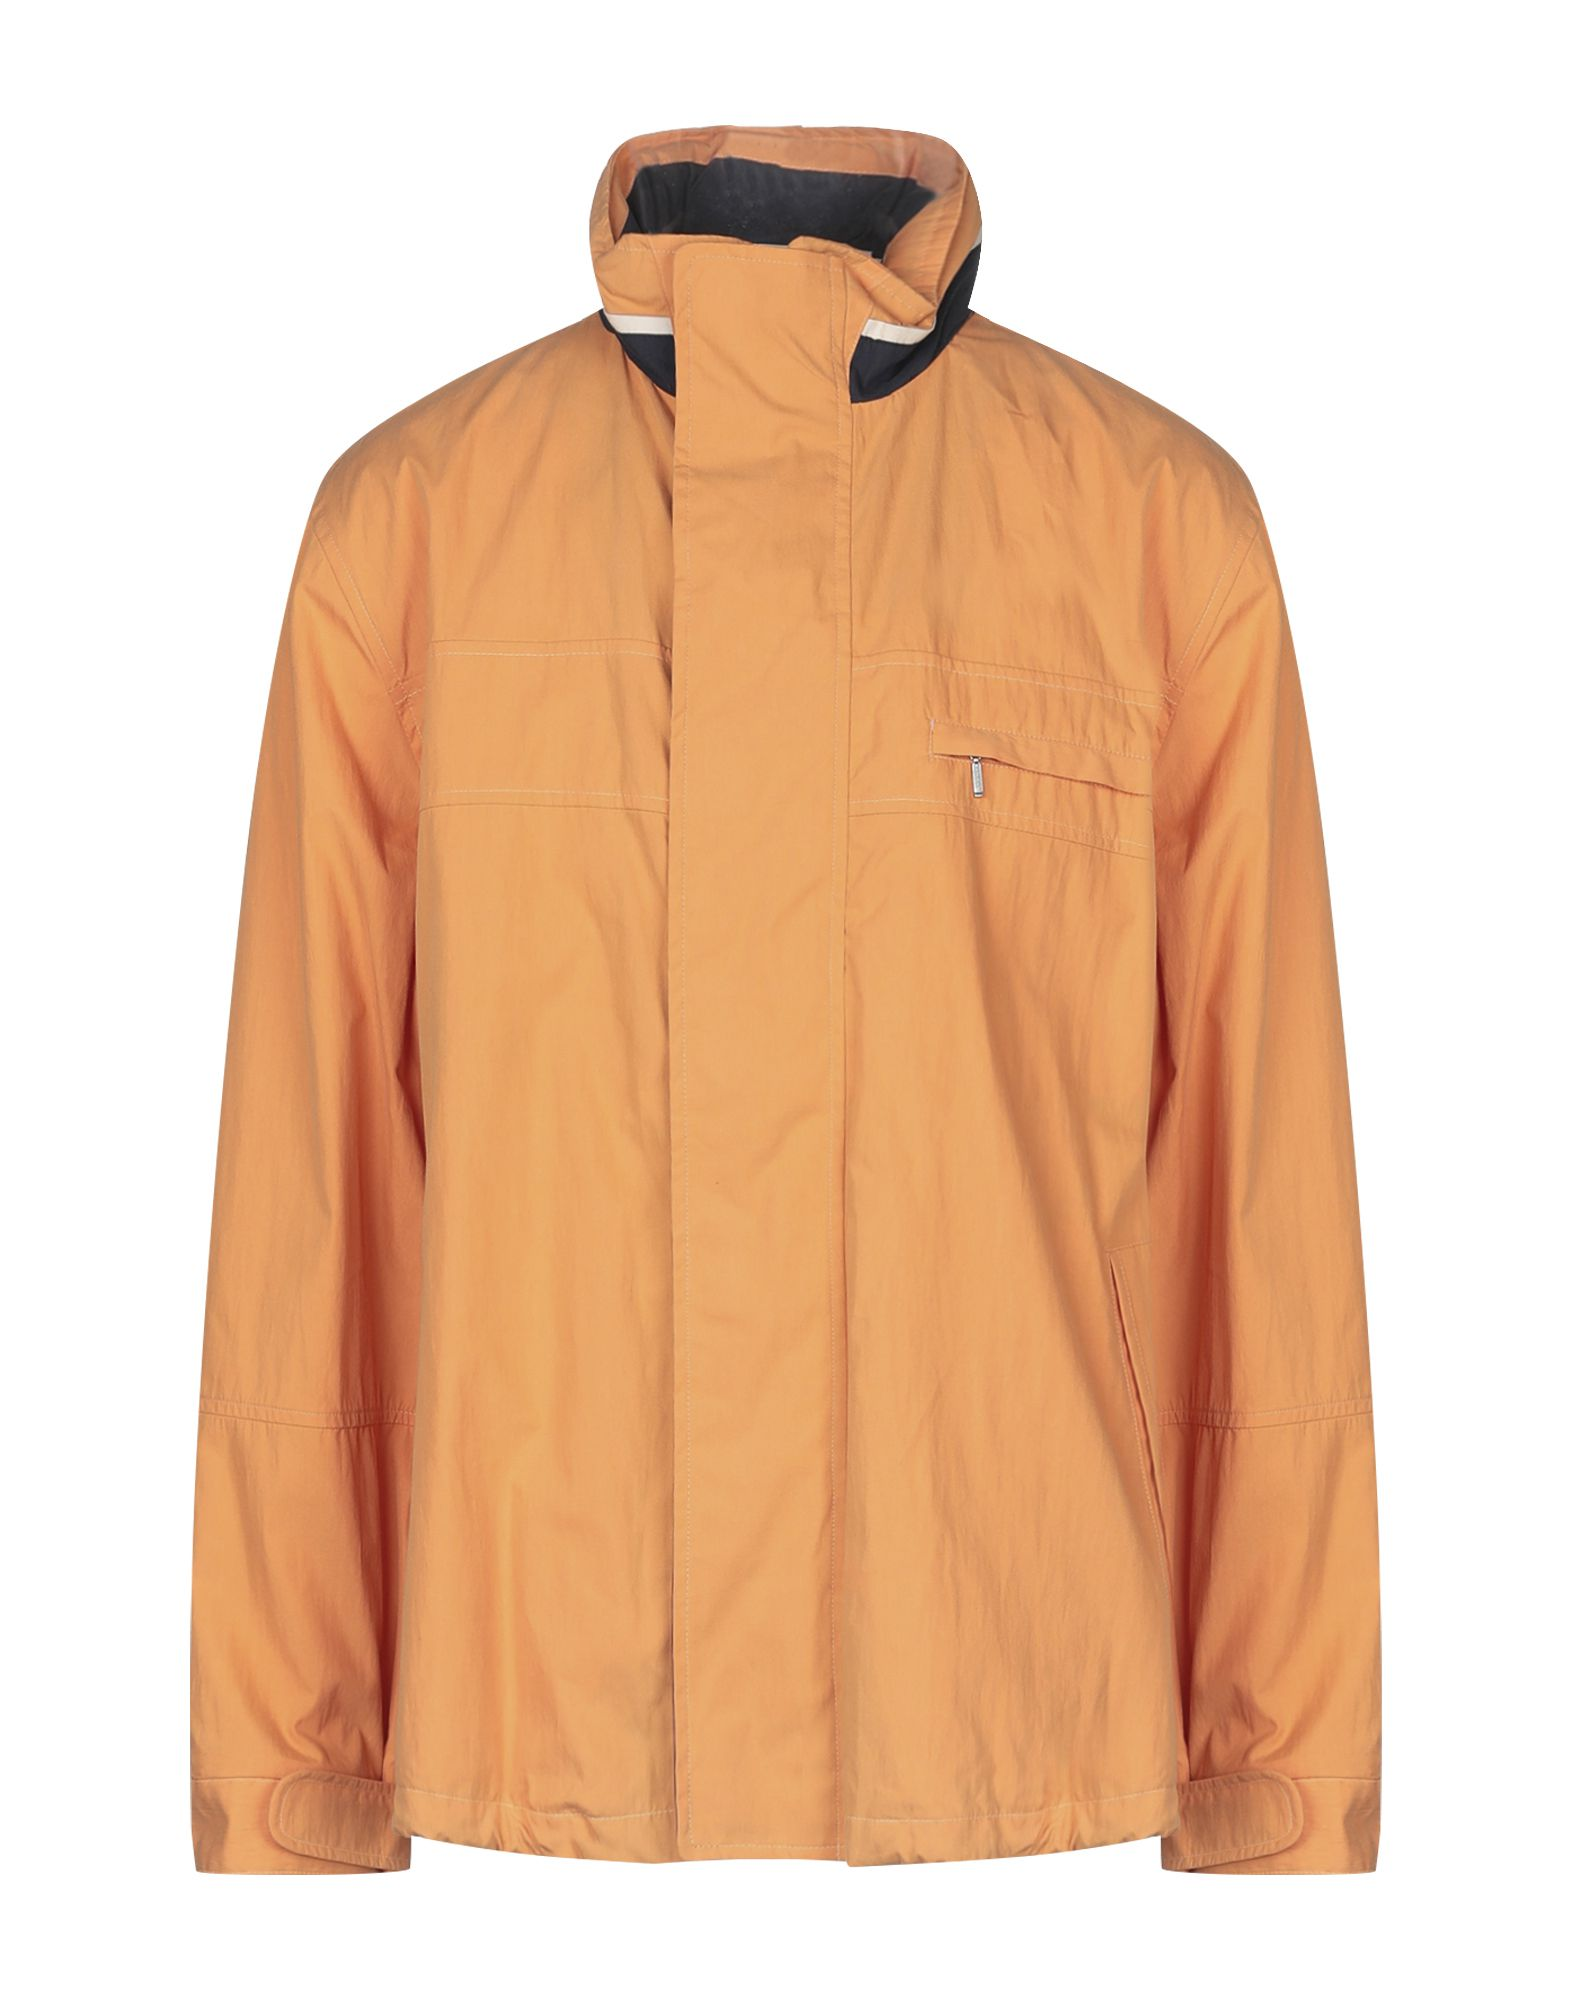 R.C.P. by ASCOT SPORT Куртка ascot sport куртка